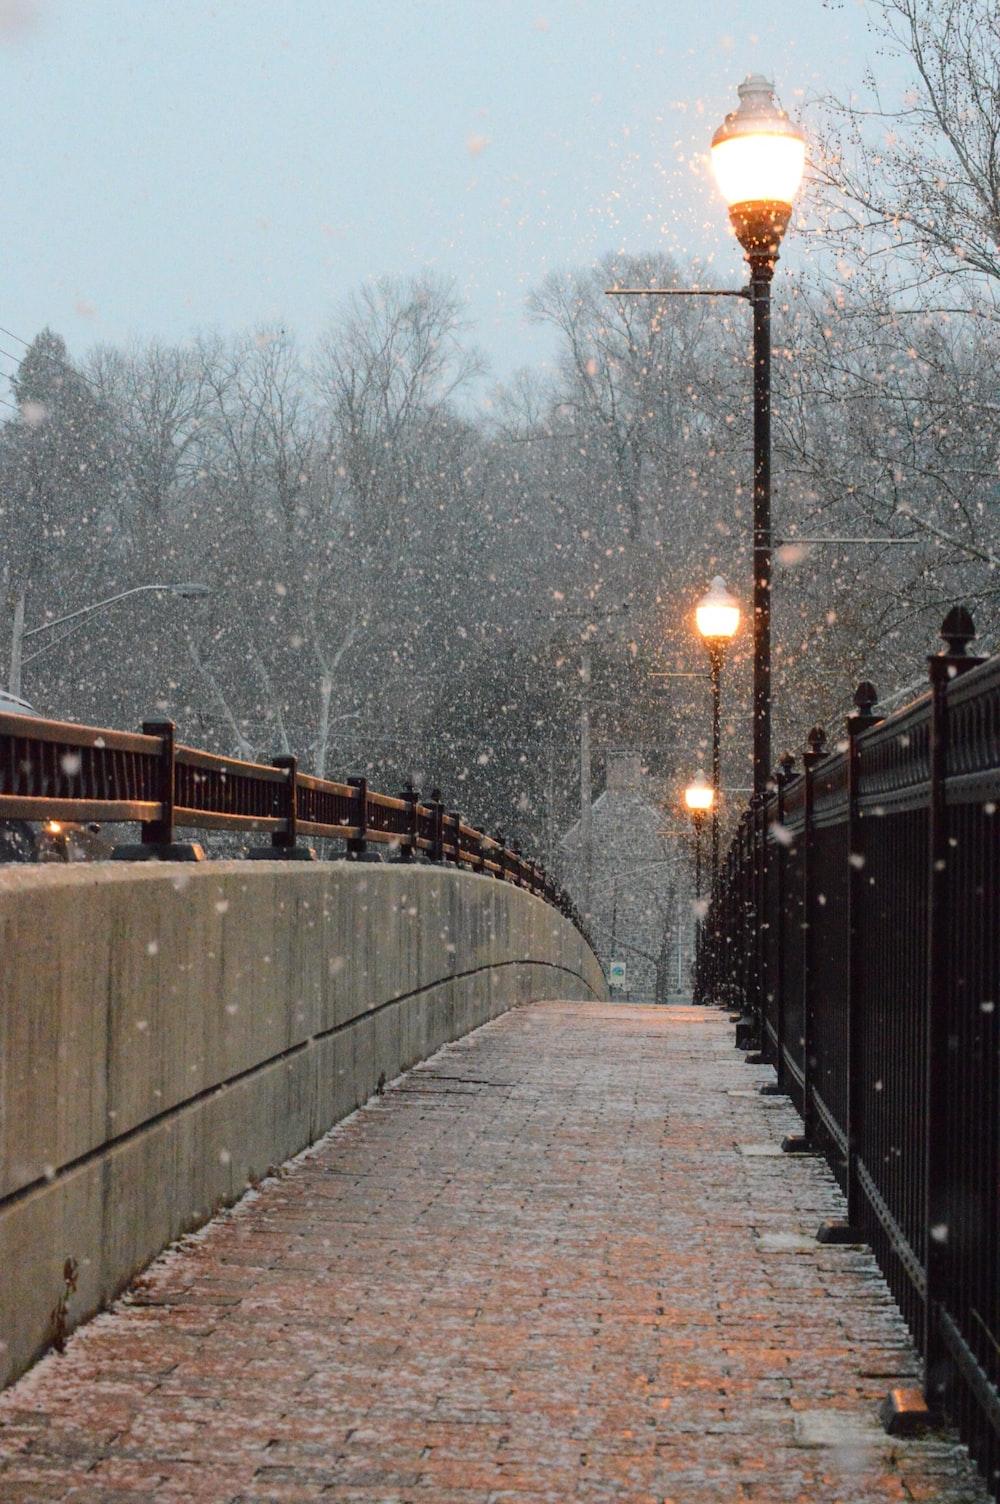 photo of turned on street lights near railing